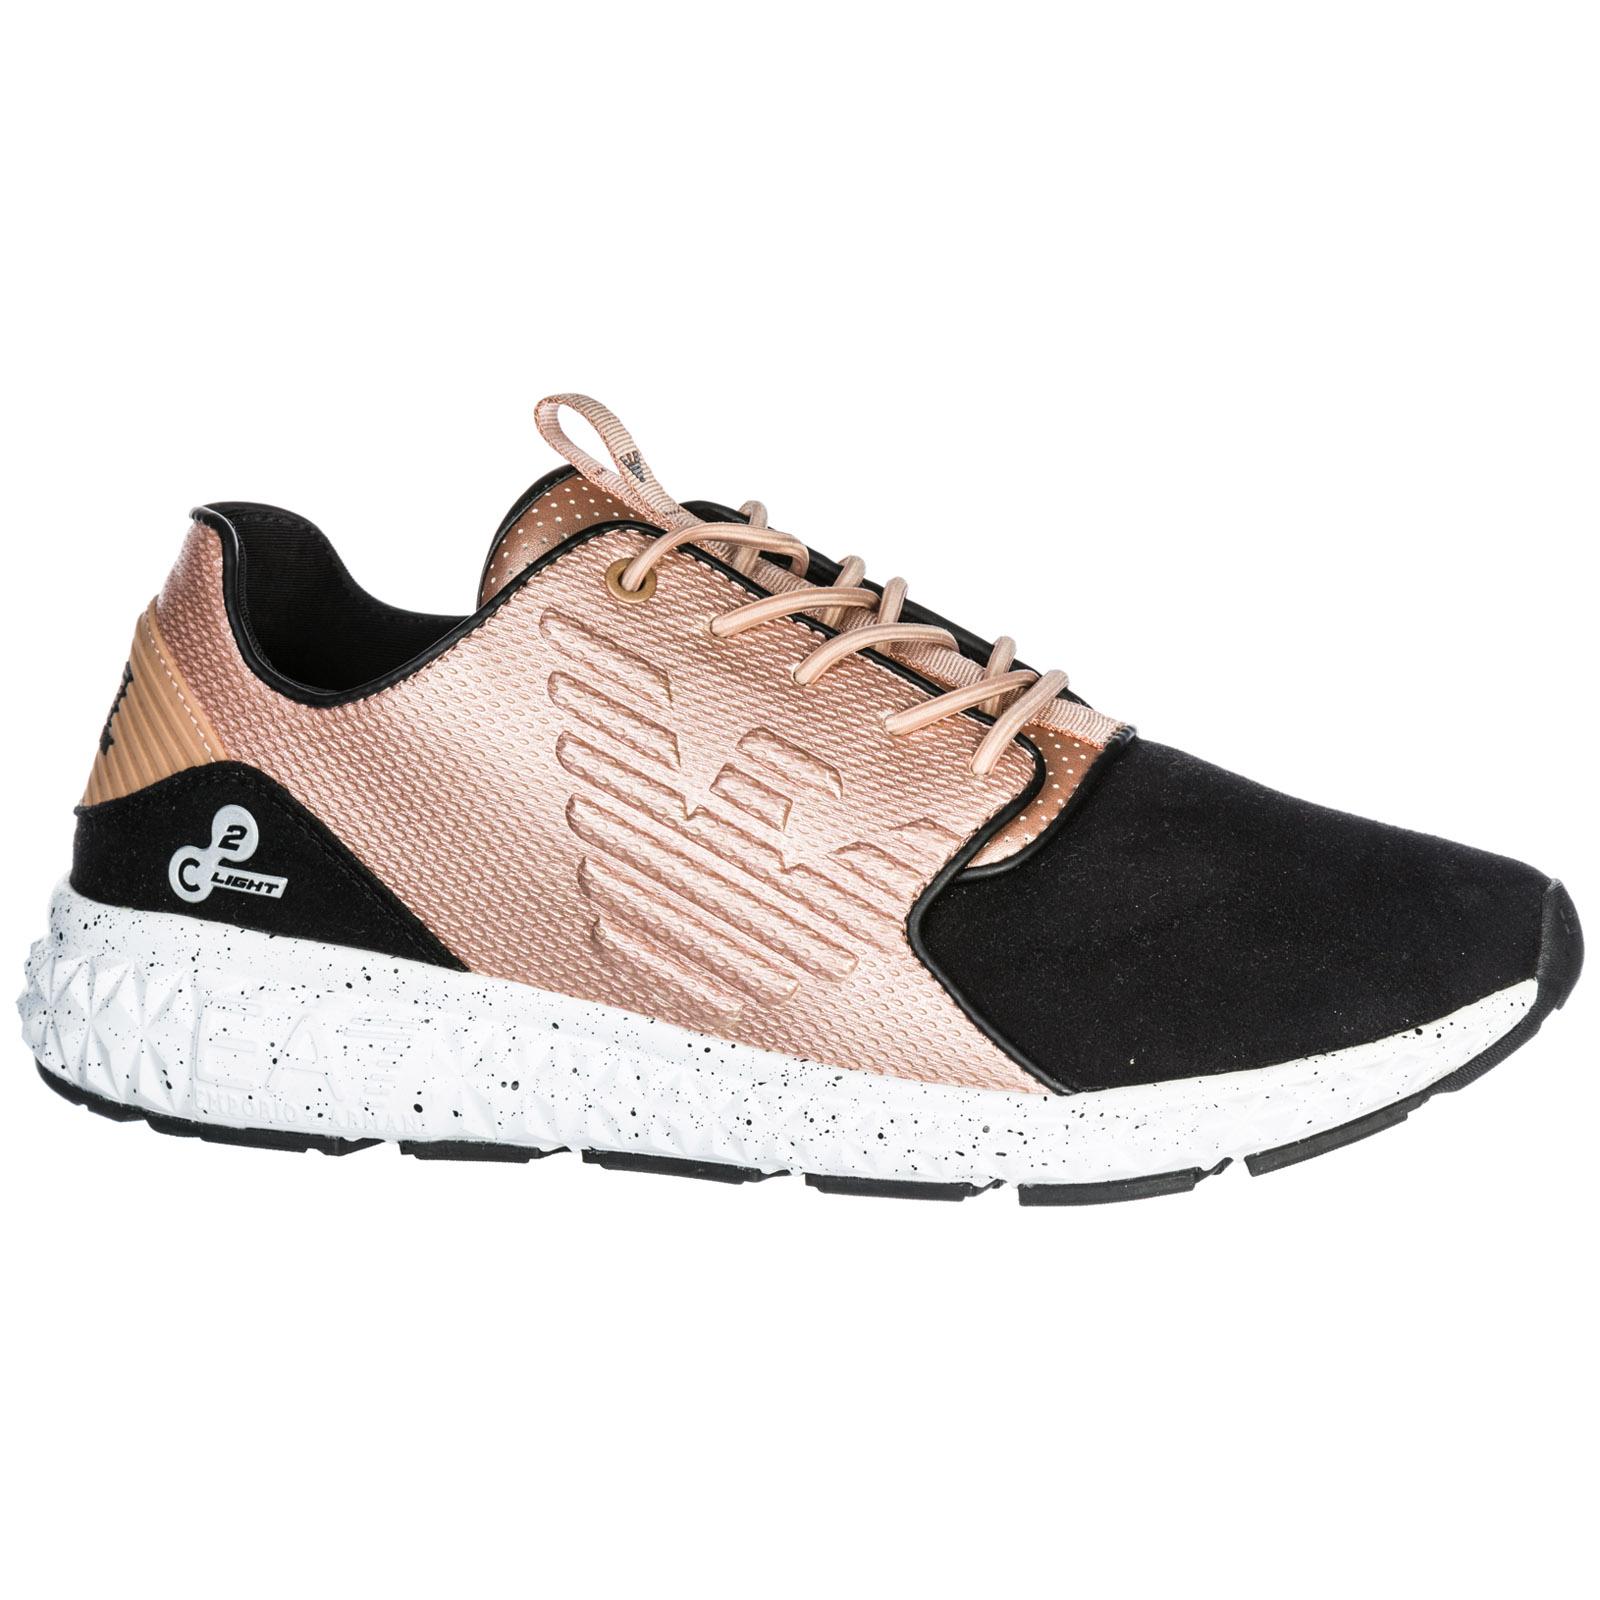 Ea7 Emporio X8x013xk016a797 Armani Sneakers Rose Gold YwvZEZx4q